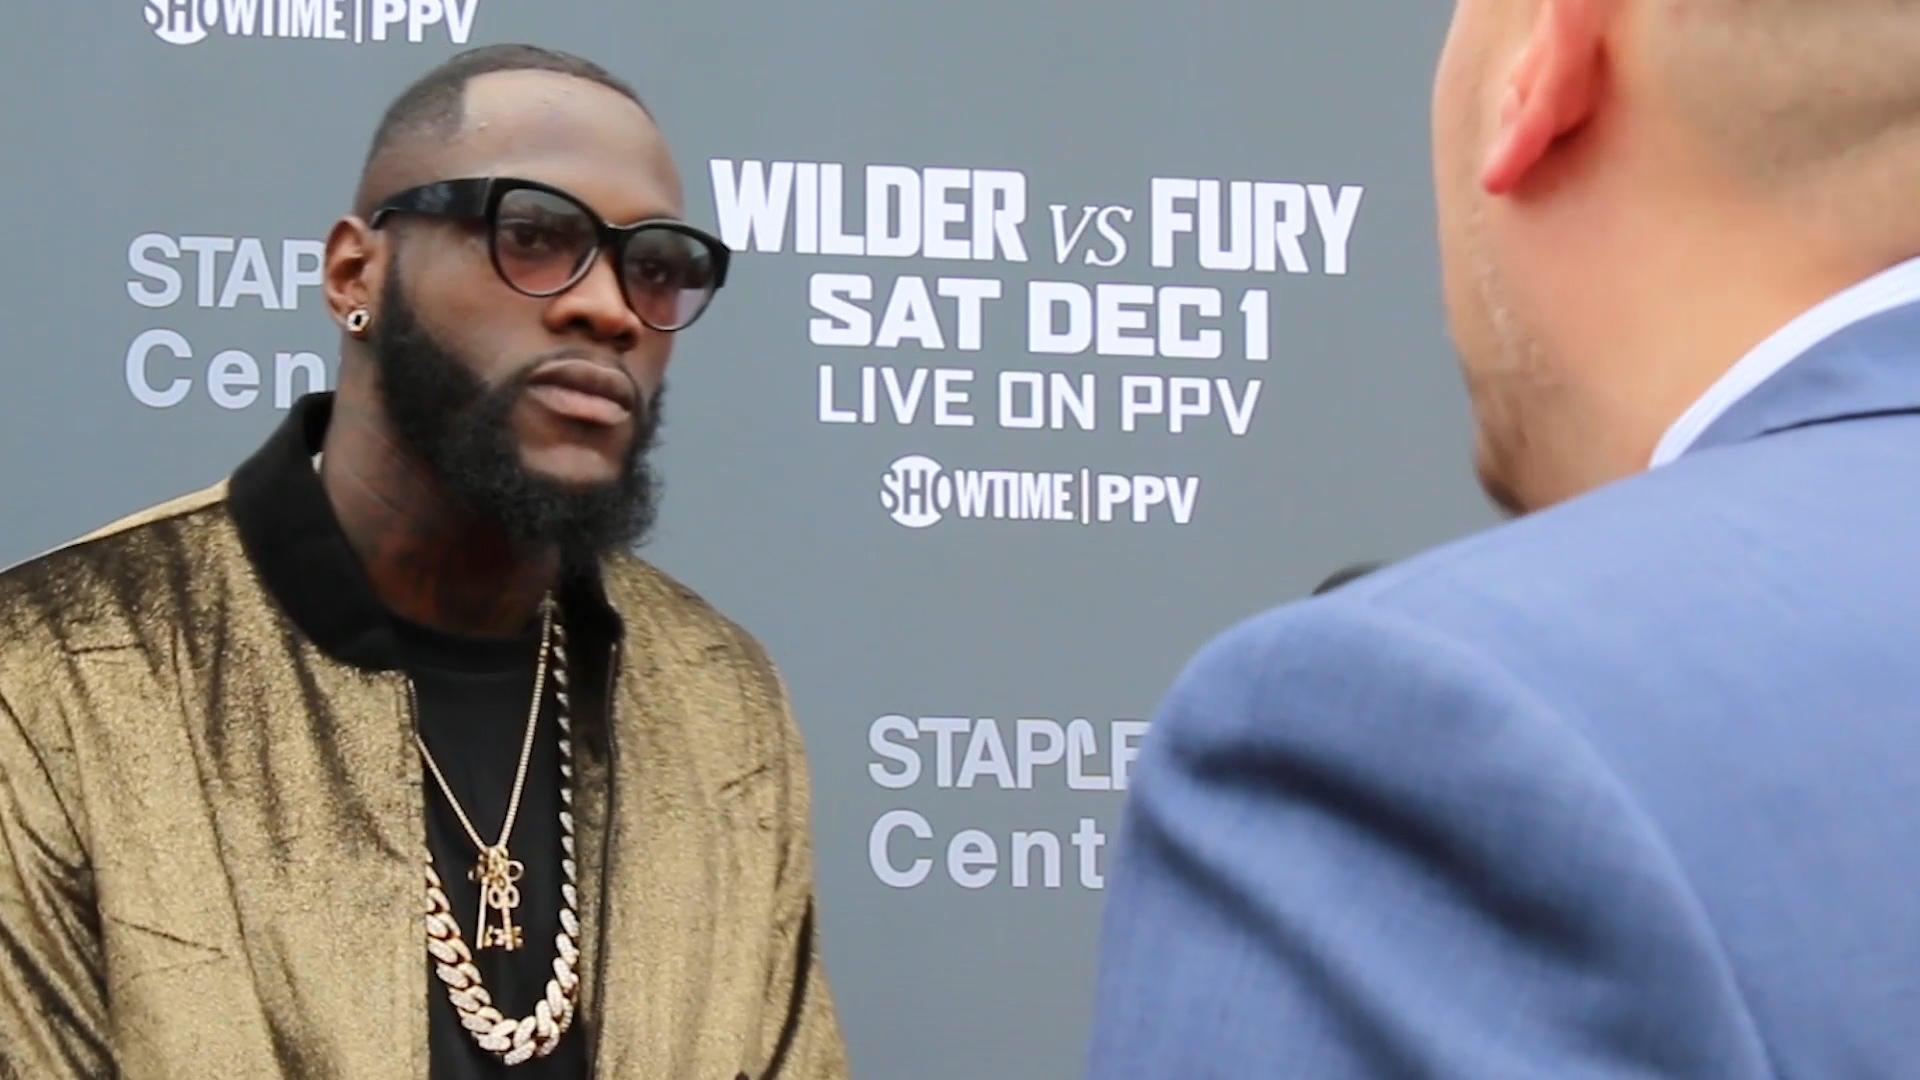 Boxing schedule for 2018 features Deontay Wilder vs. Tyson Fury, Canelo Alvarez, Vasiliy Lomachenko